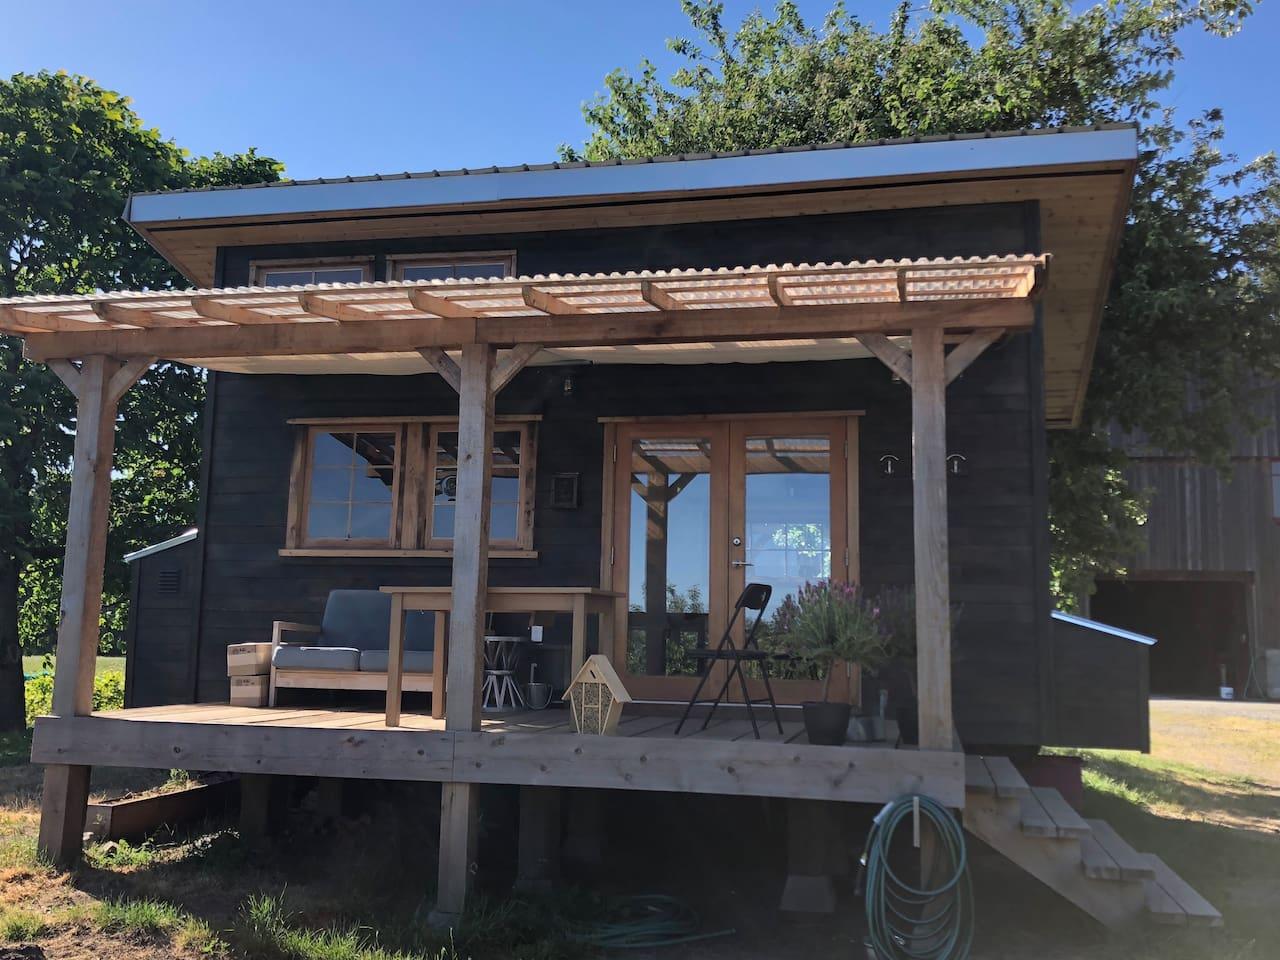 Tiny Home on Blueberry Farm